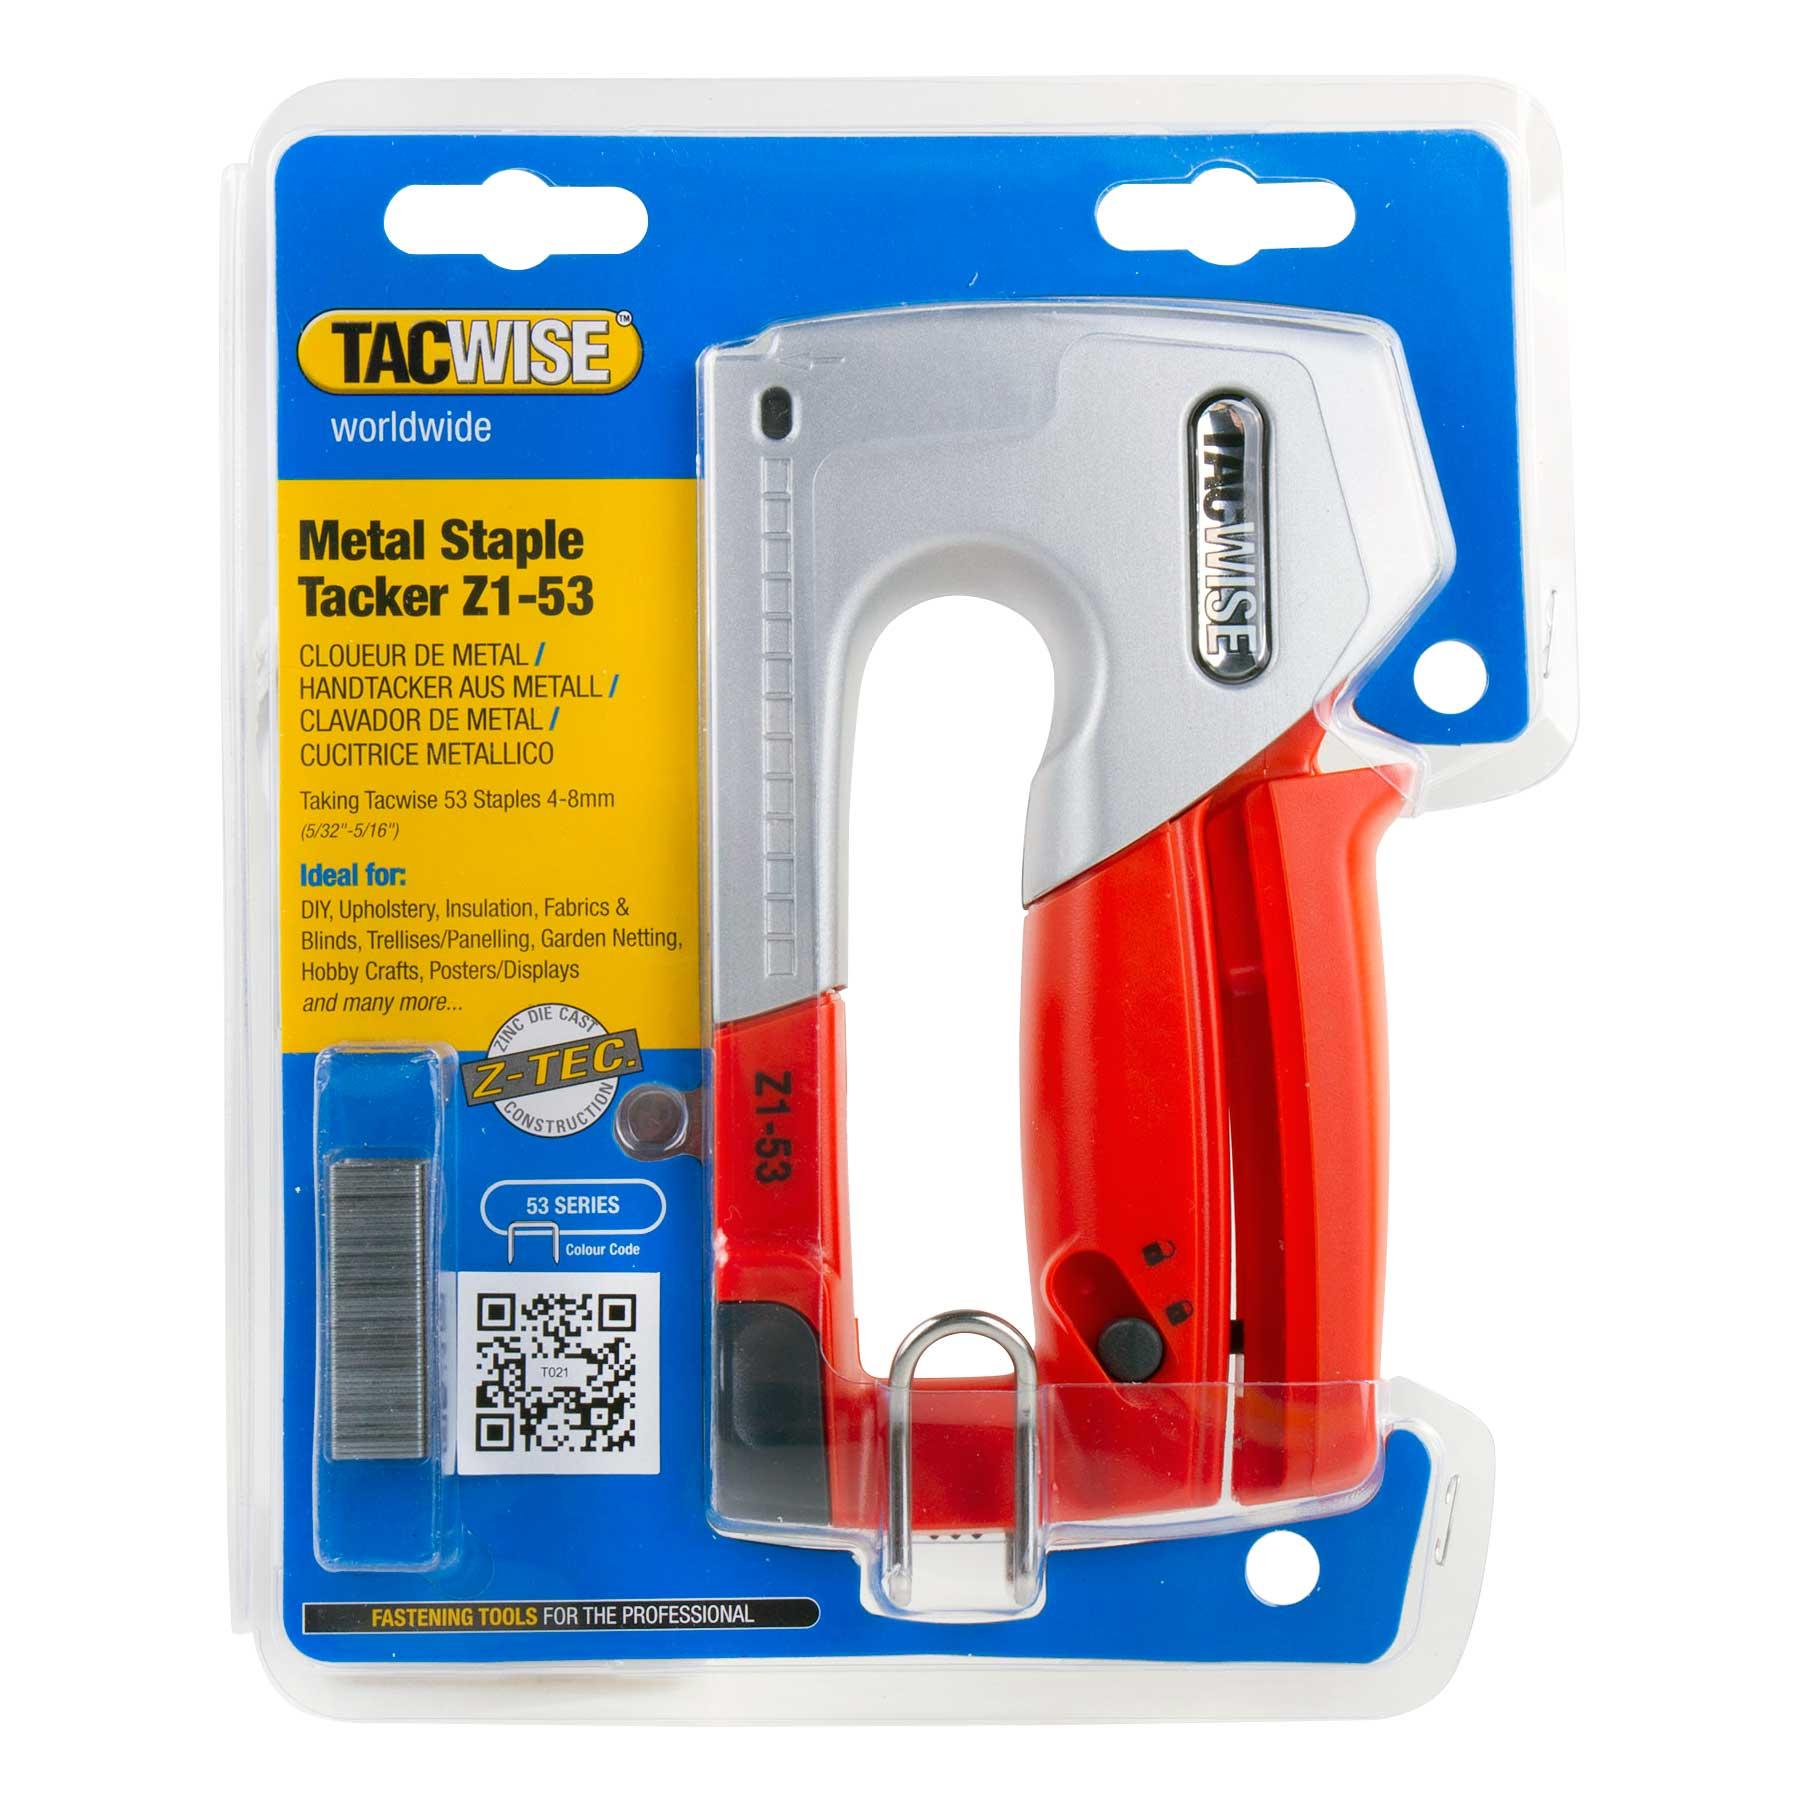 research.unir.net Home & Garden Hand Tools 8mm 0856 Tacwise Z1-53 ...